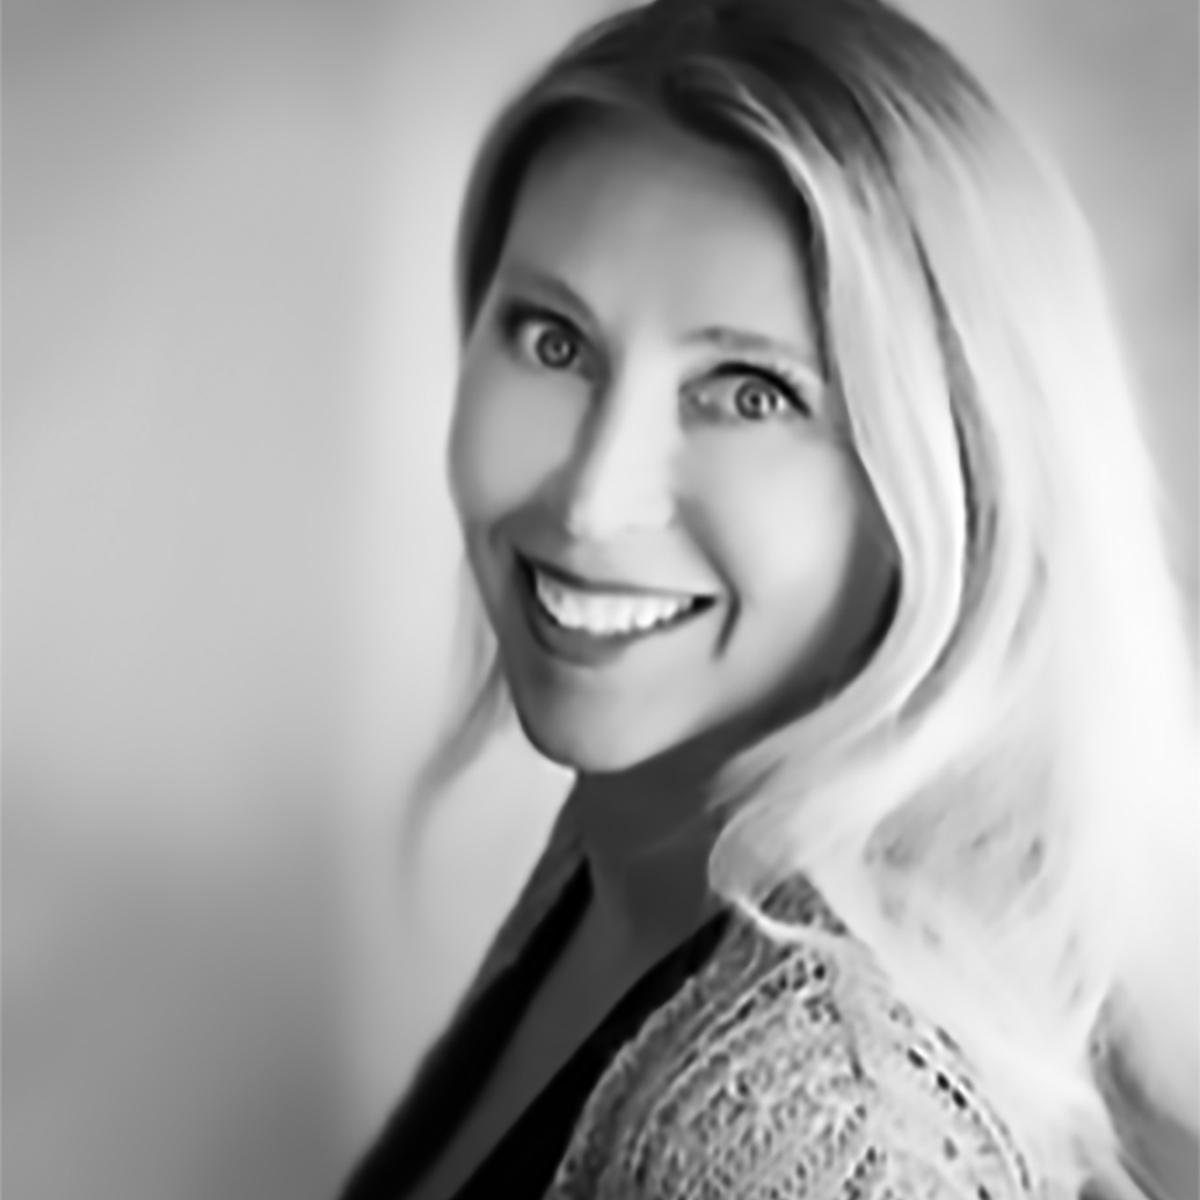 Beth-McDougall-MD-headshot-BW-SS.jpg